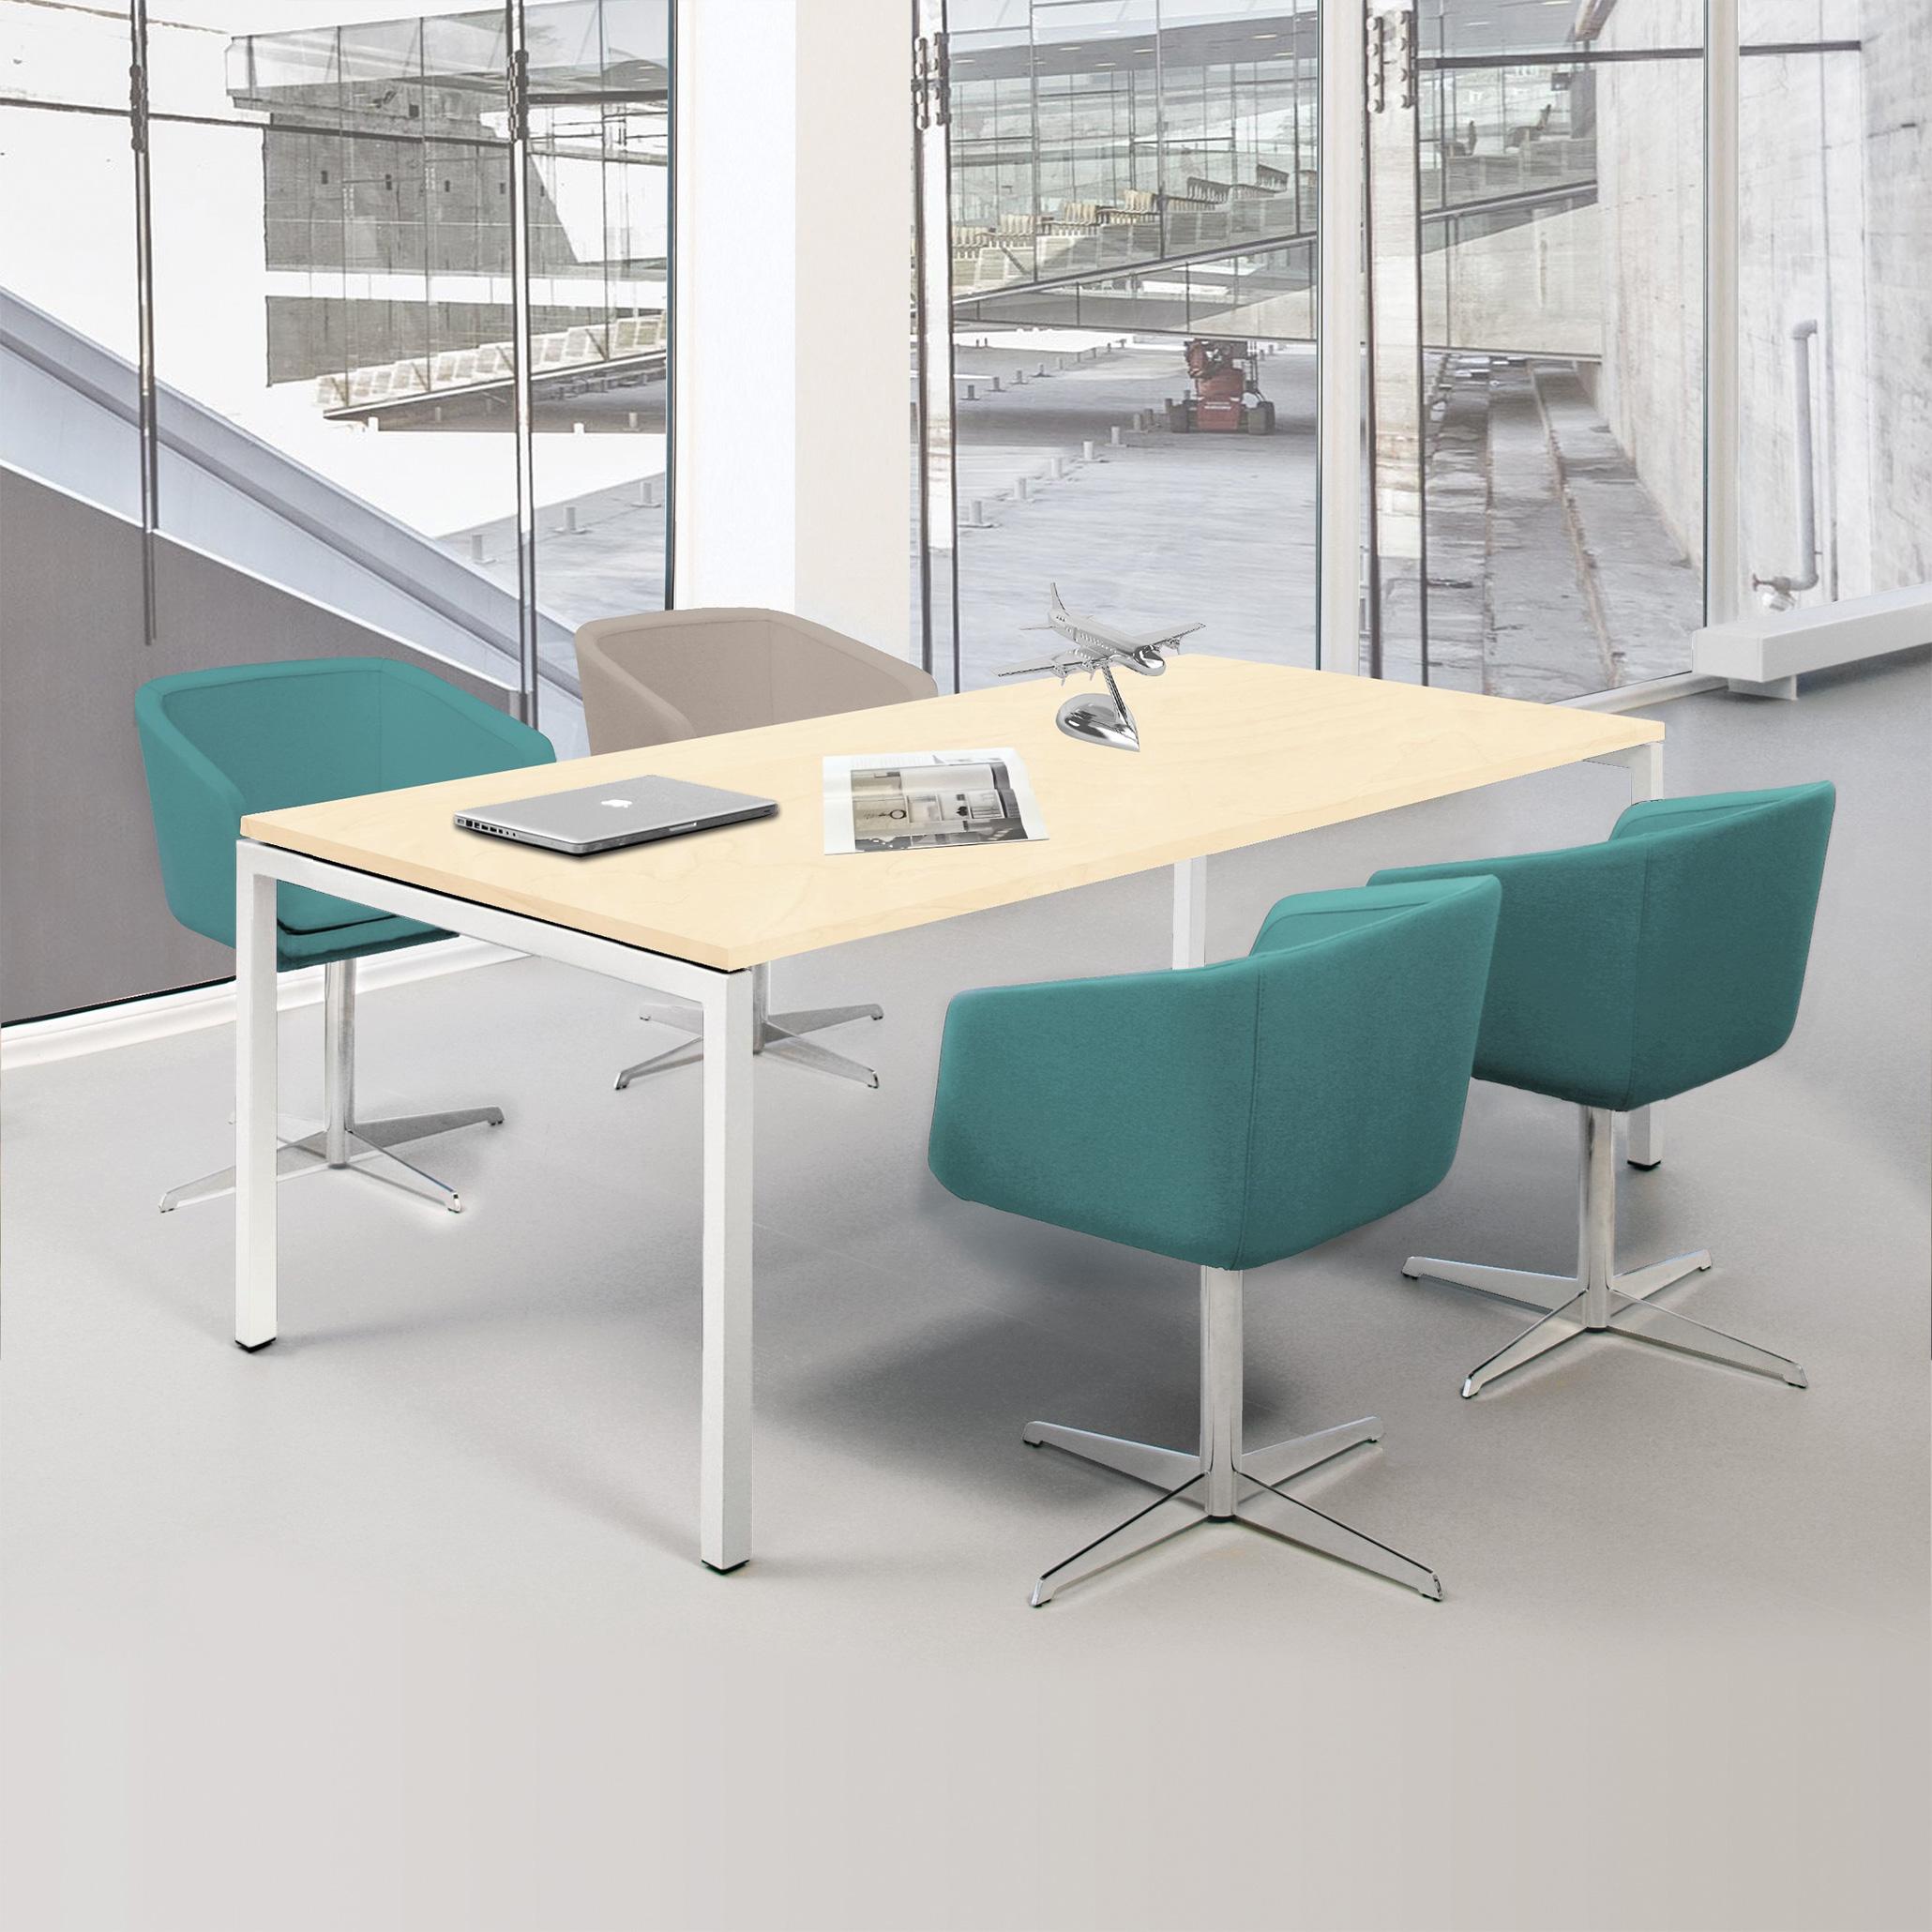 NOVA Besprechungstisch 180x80cm Ahorn 4-6 Pers. Konferenztisch Meetingtisch